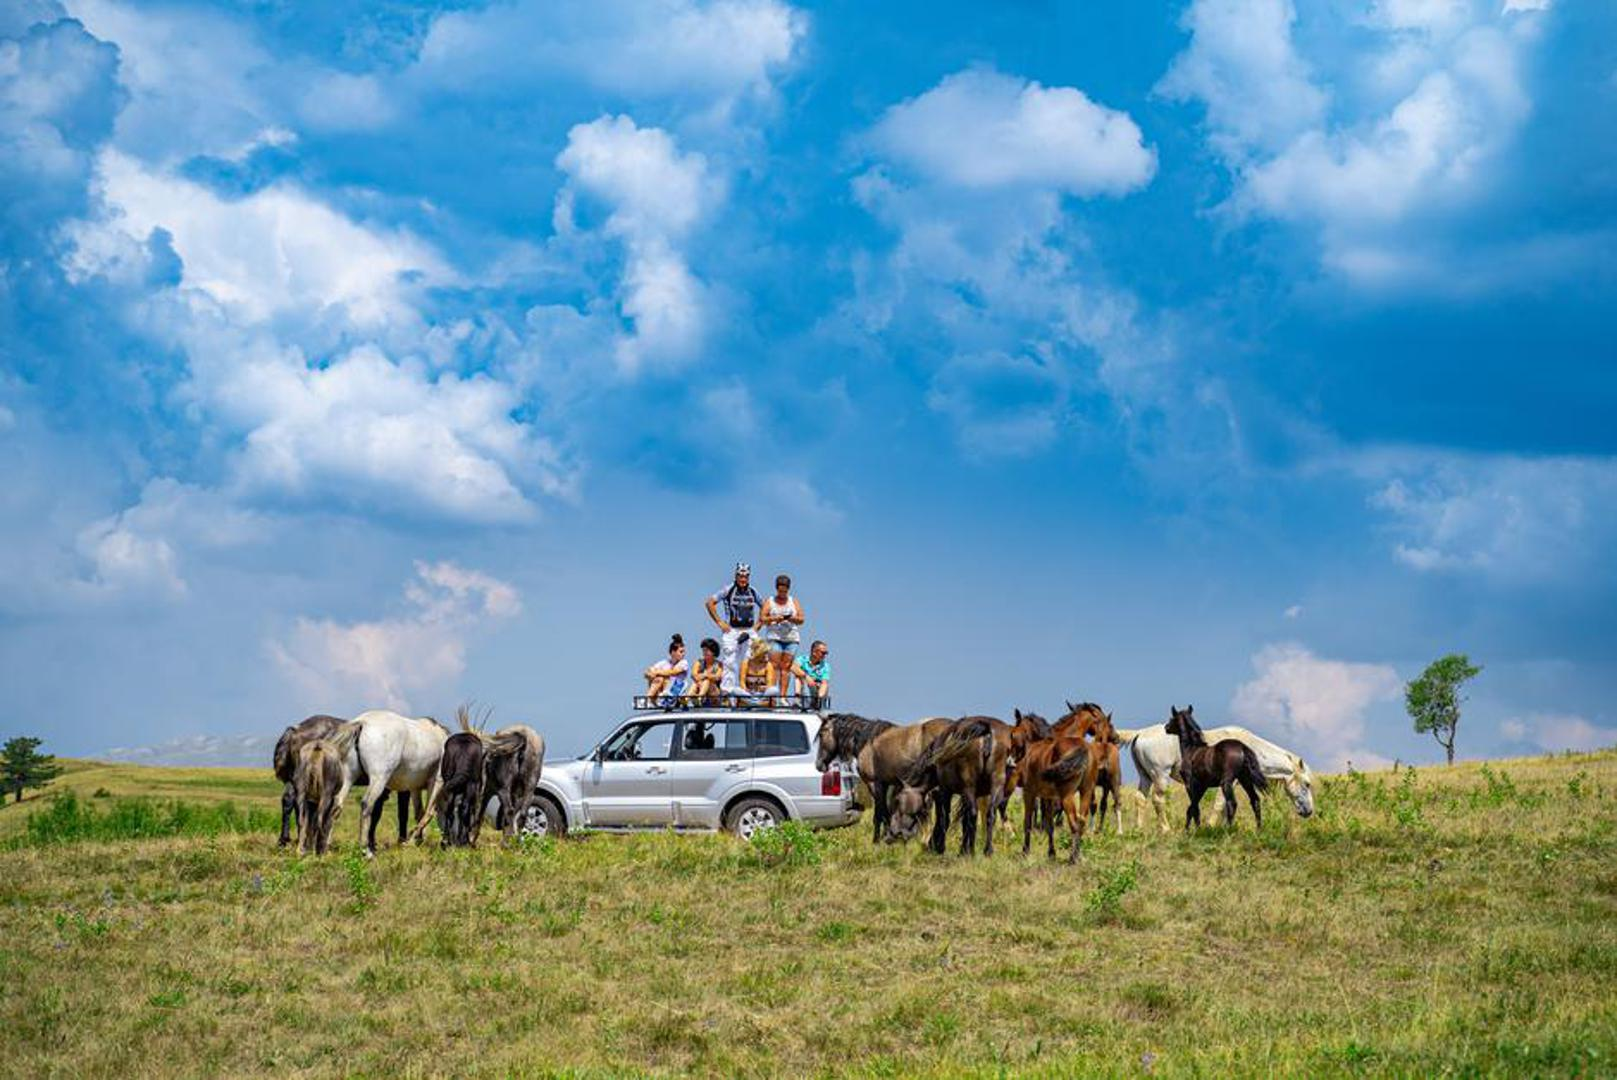 LIVNO: Prkose zvijerima i krivolovcima: Posljednje veliko krdo divljih konja u Europi